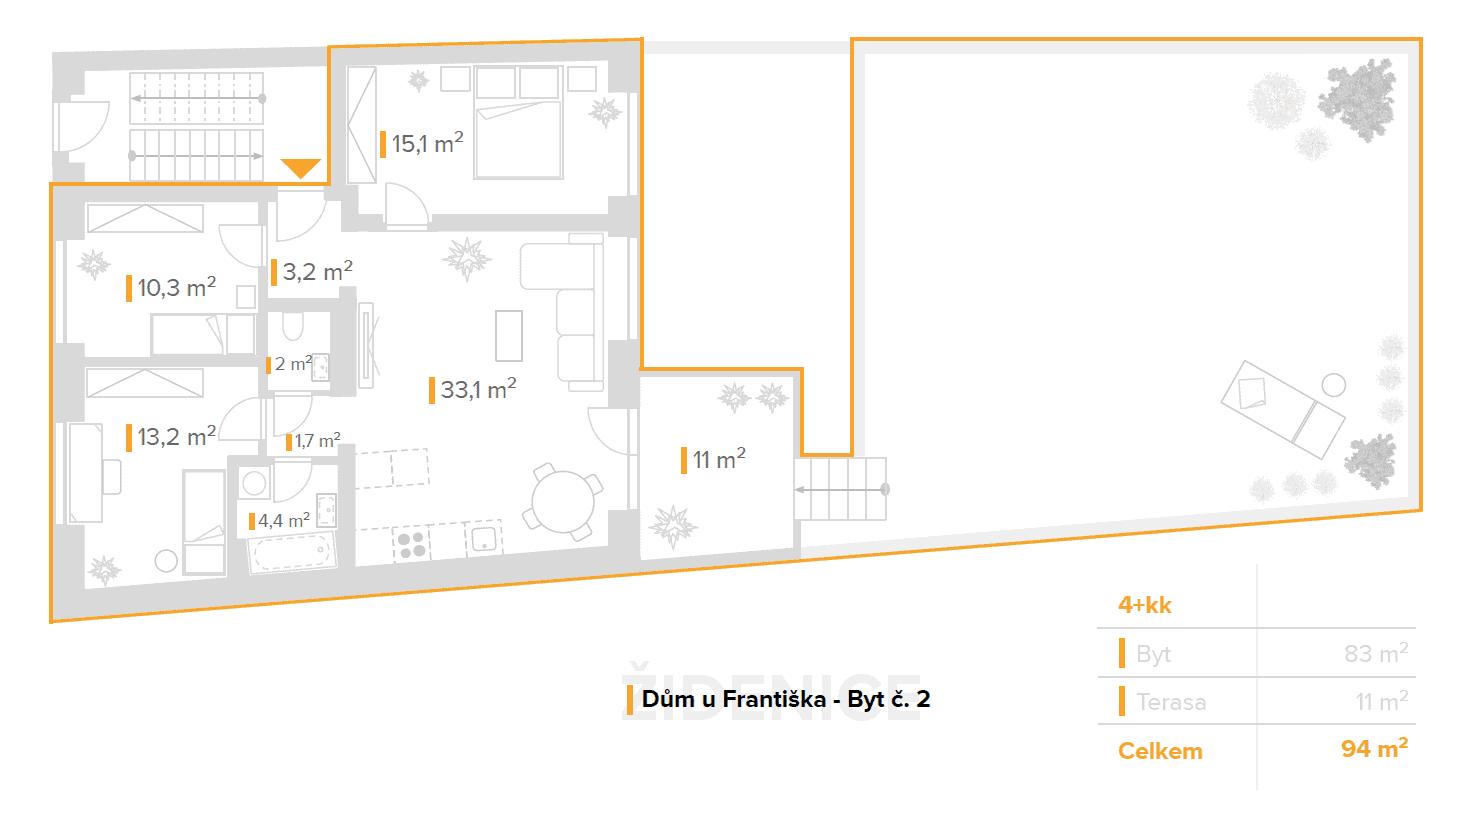 4+kk – Dům u Františka (2)